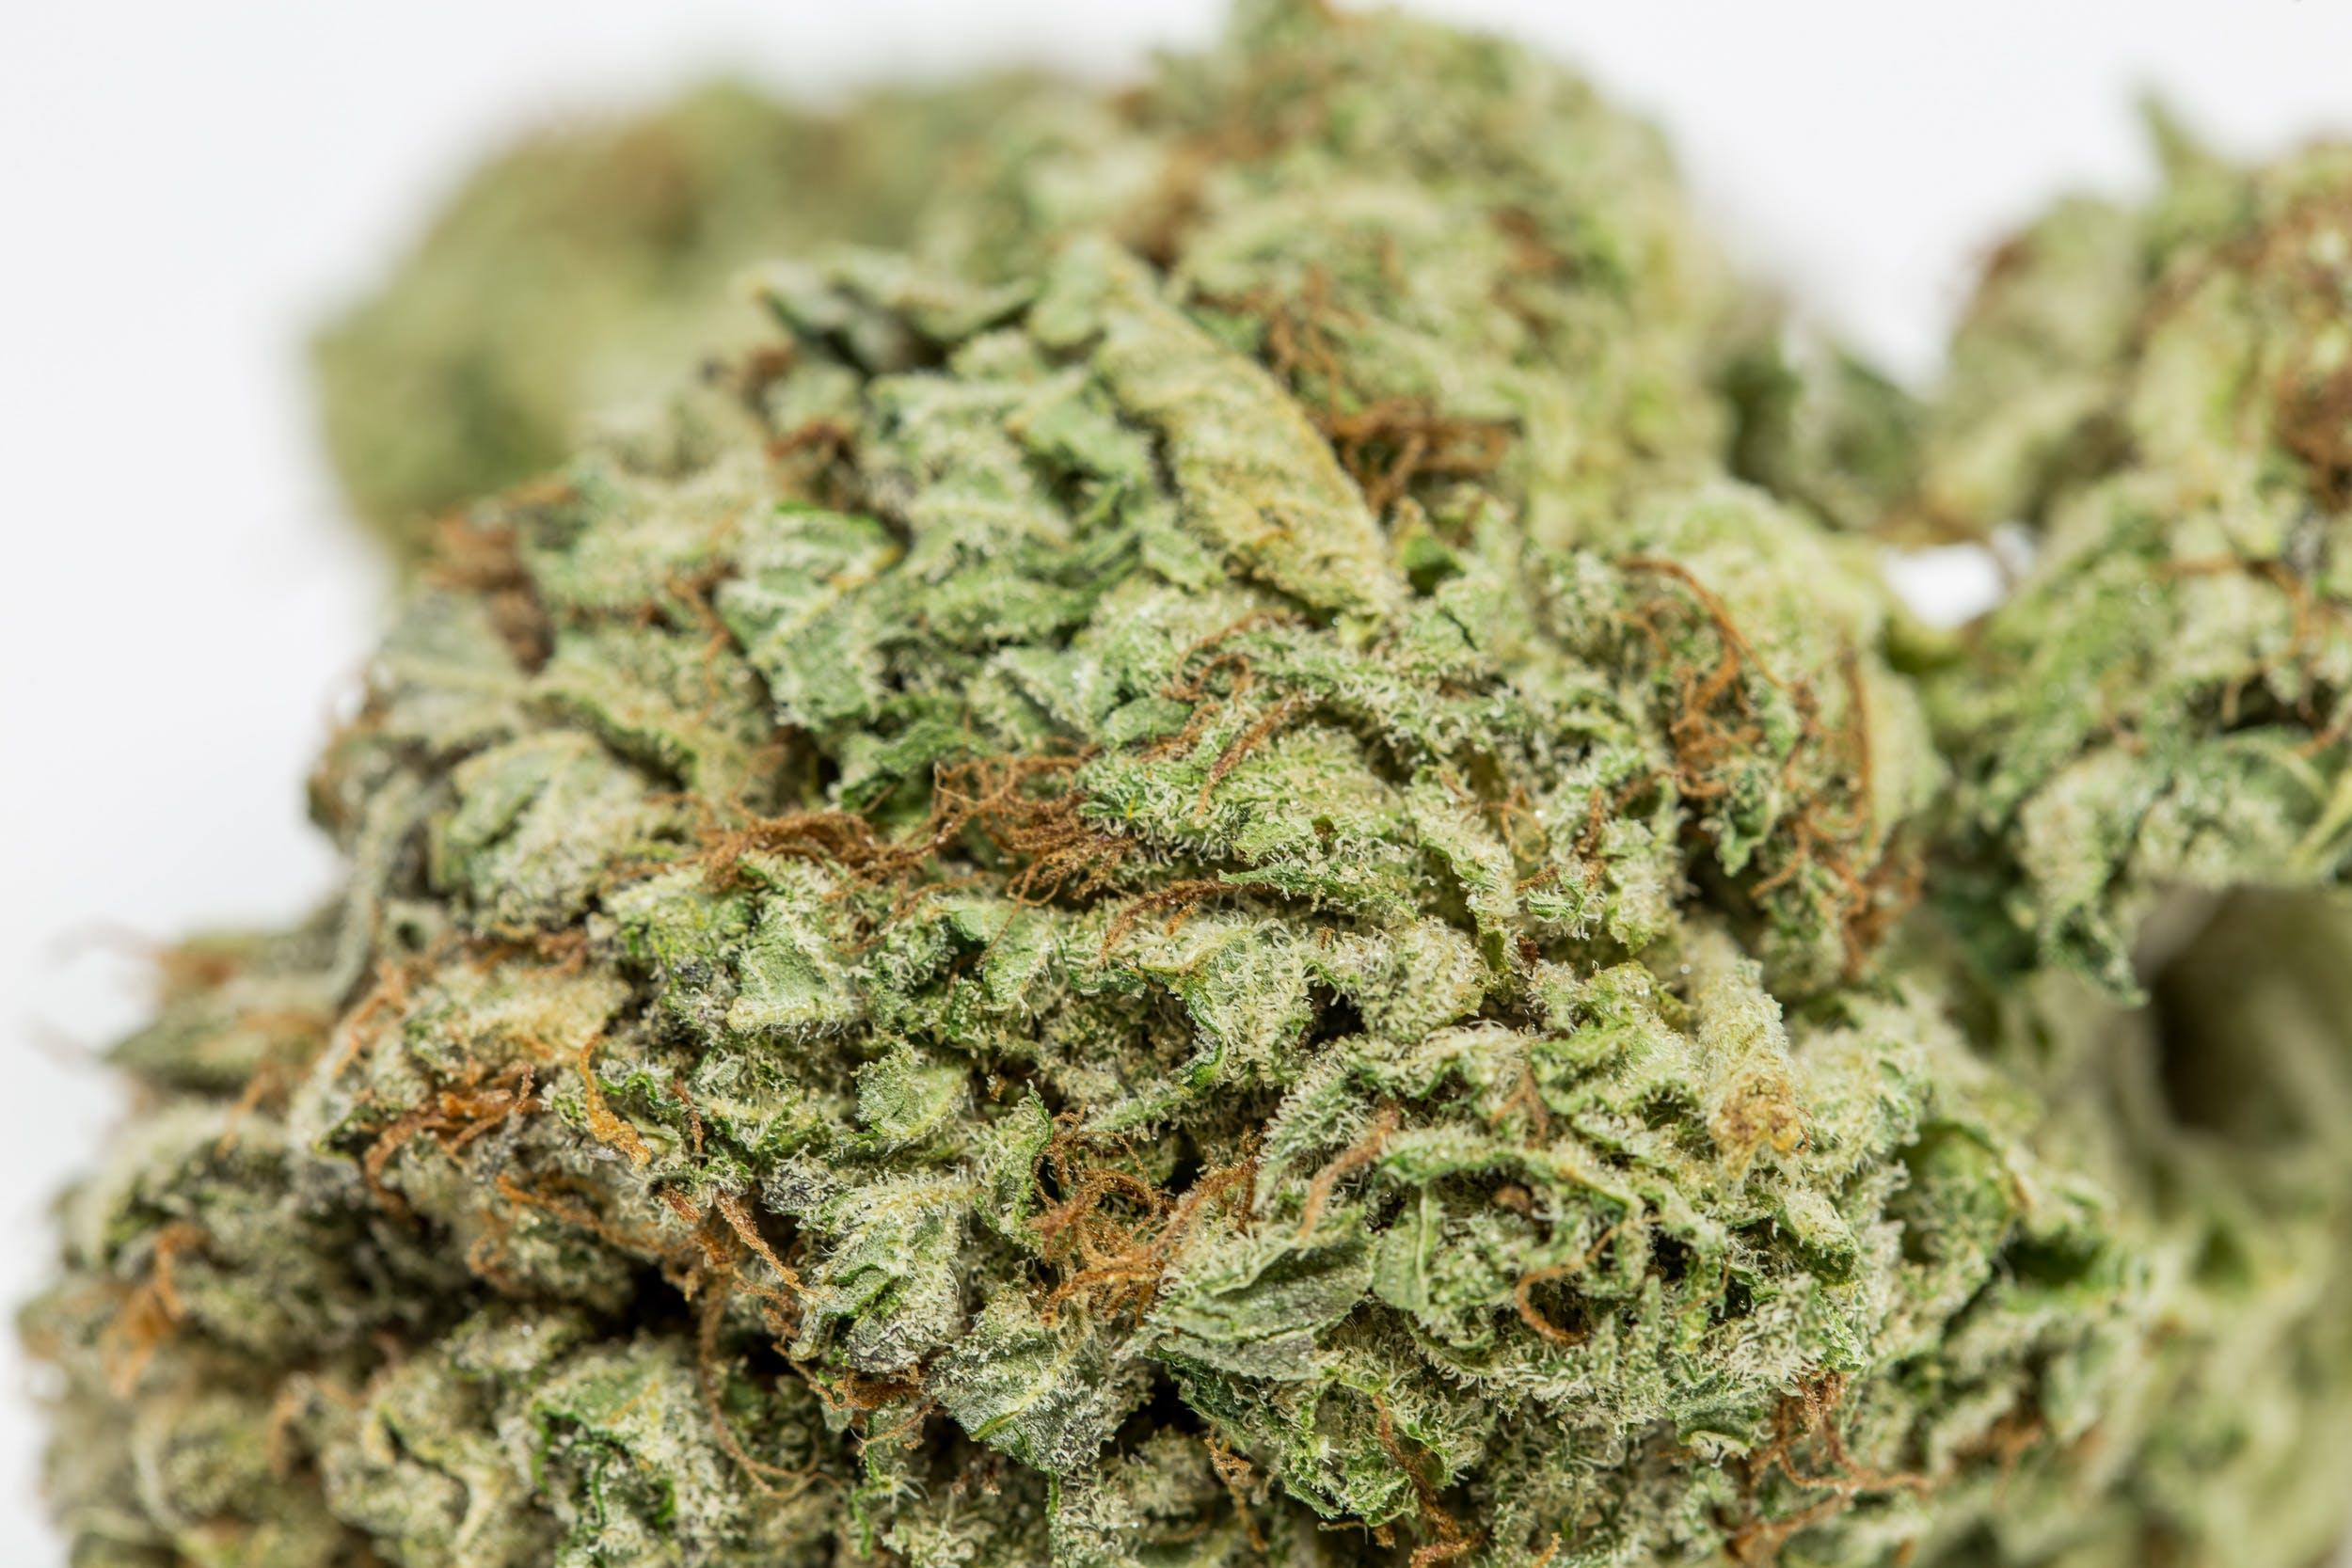 Afghan Haze Weed; Afghan Haze Cannabis Strain; Afghan Haze Hybrid Marjuana Strain